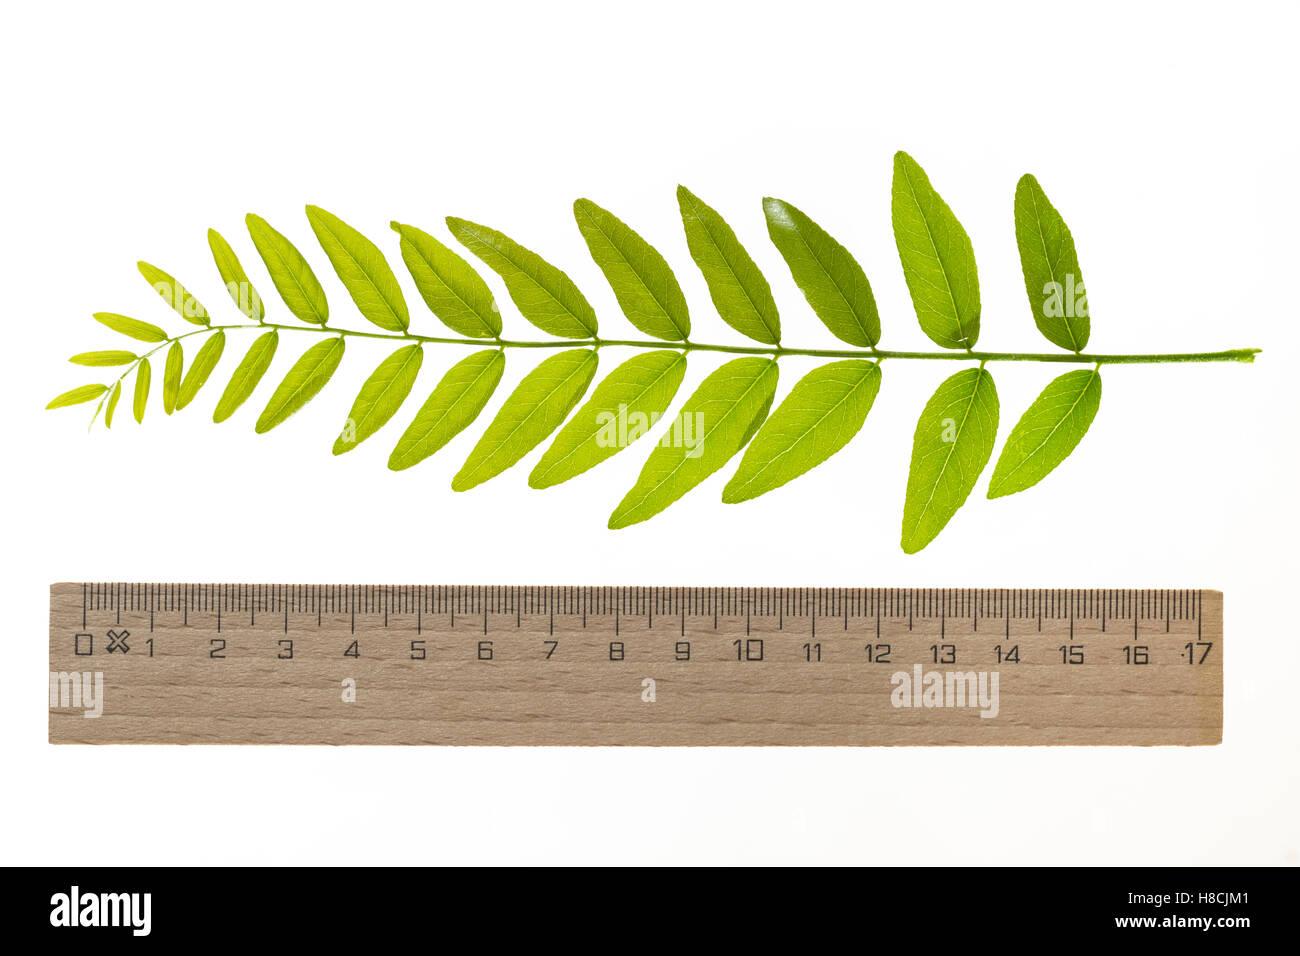 Amerikanische Gleditschie, Gleditsia triacanthos, Lederhülsenbaum, Falscher Christusdorn, honey locust, thorny locust, Stock Photo